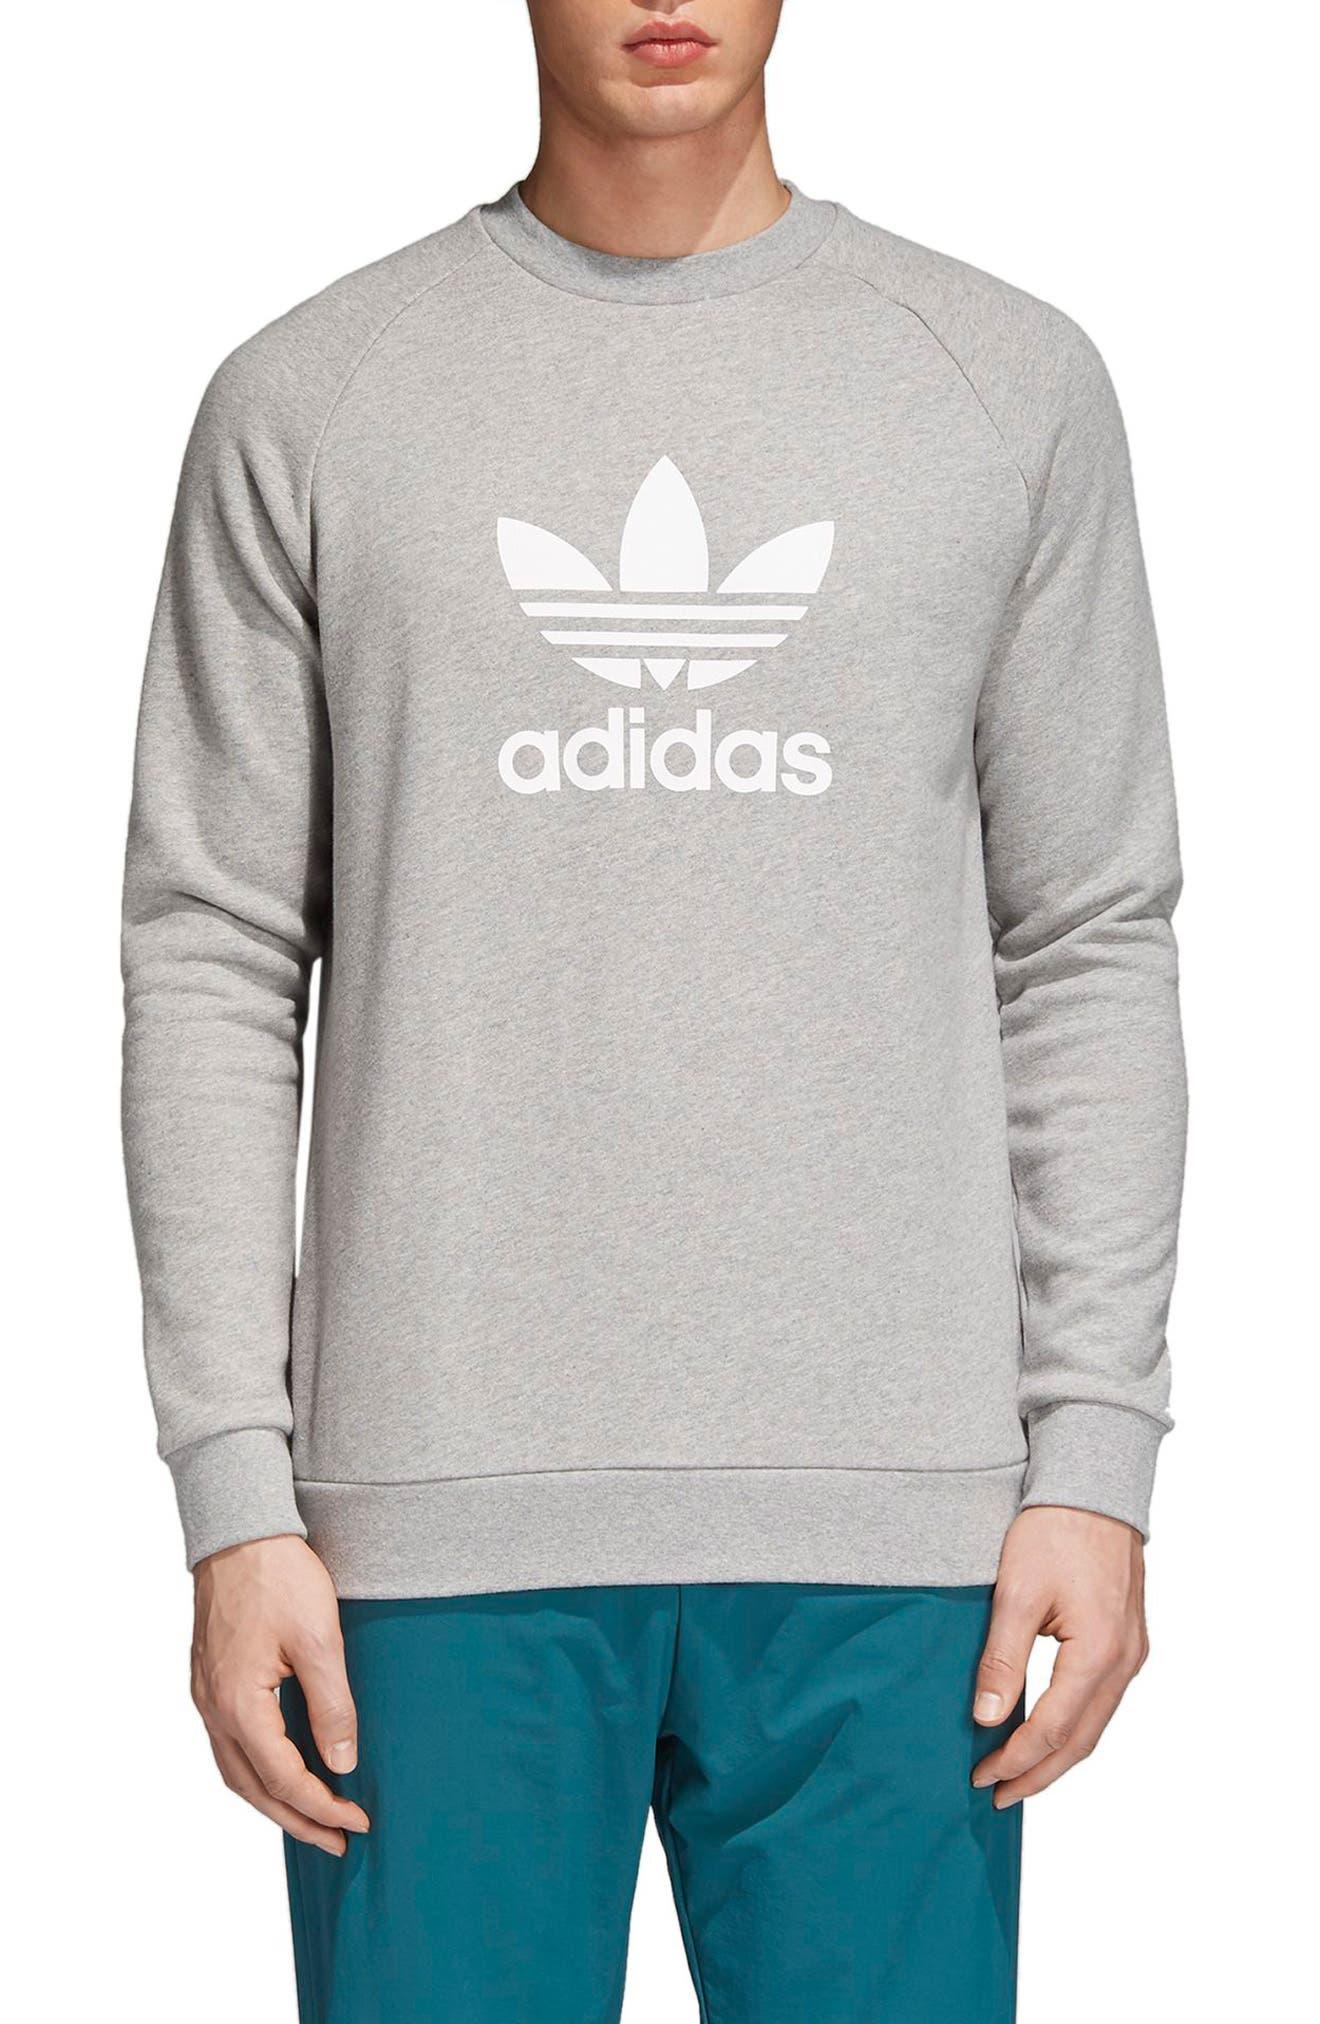 ADIDAS ORIGINALS adidas Trefoil Crewneck Sweatshirt, Main, color, MEDIUM GREY HEATHER